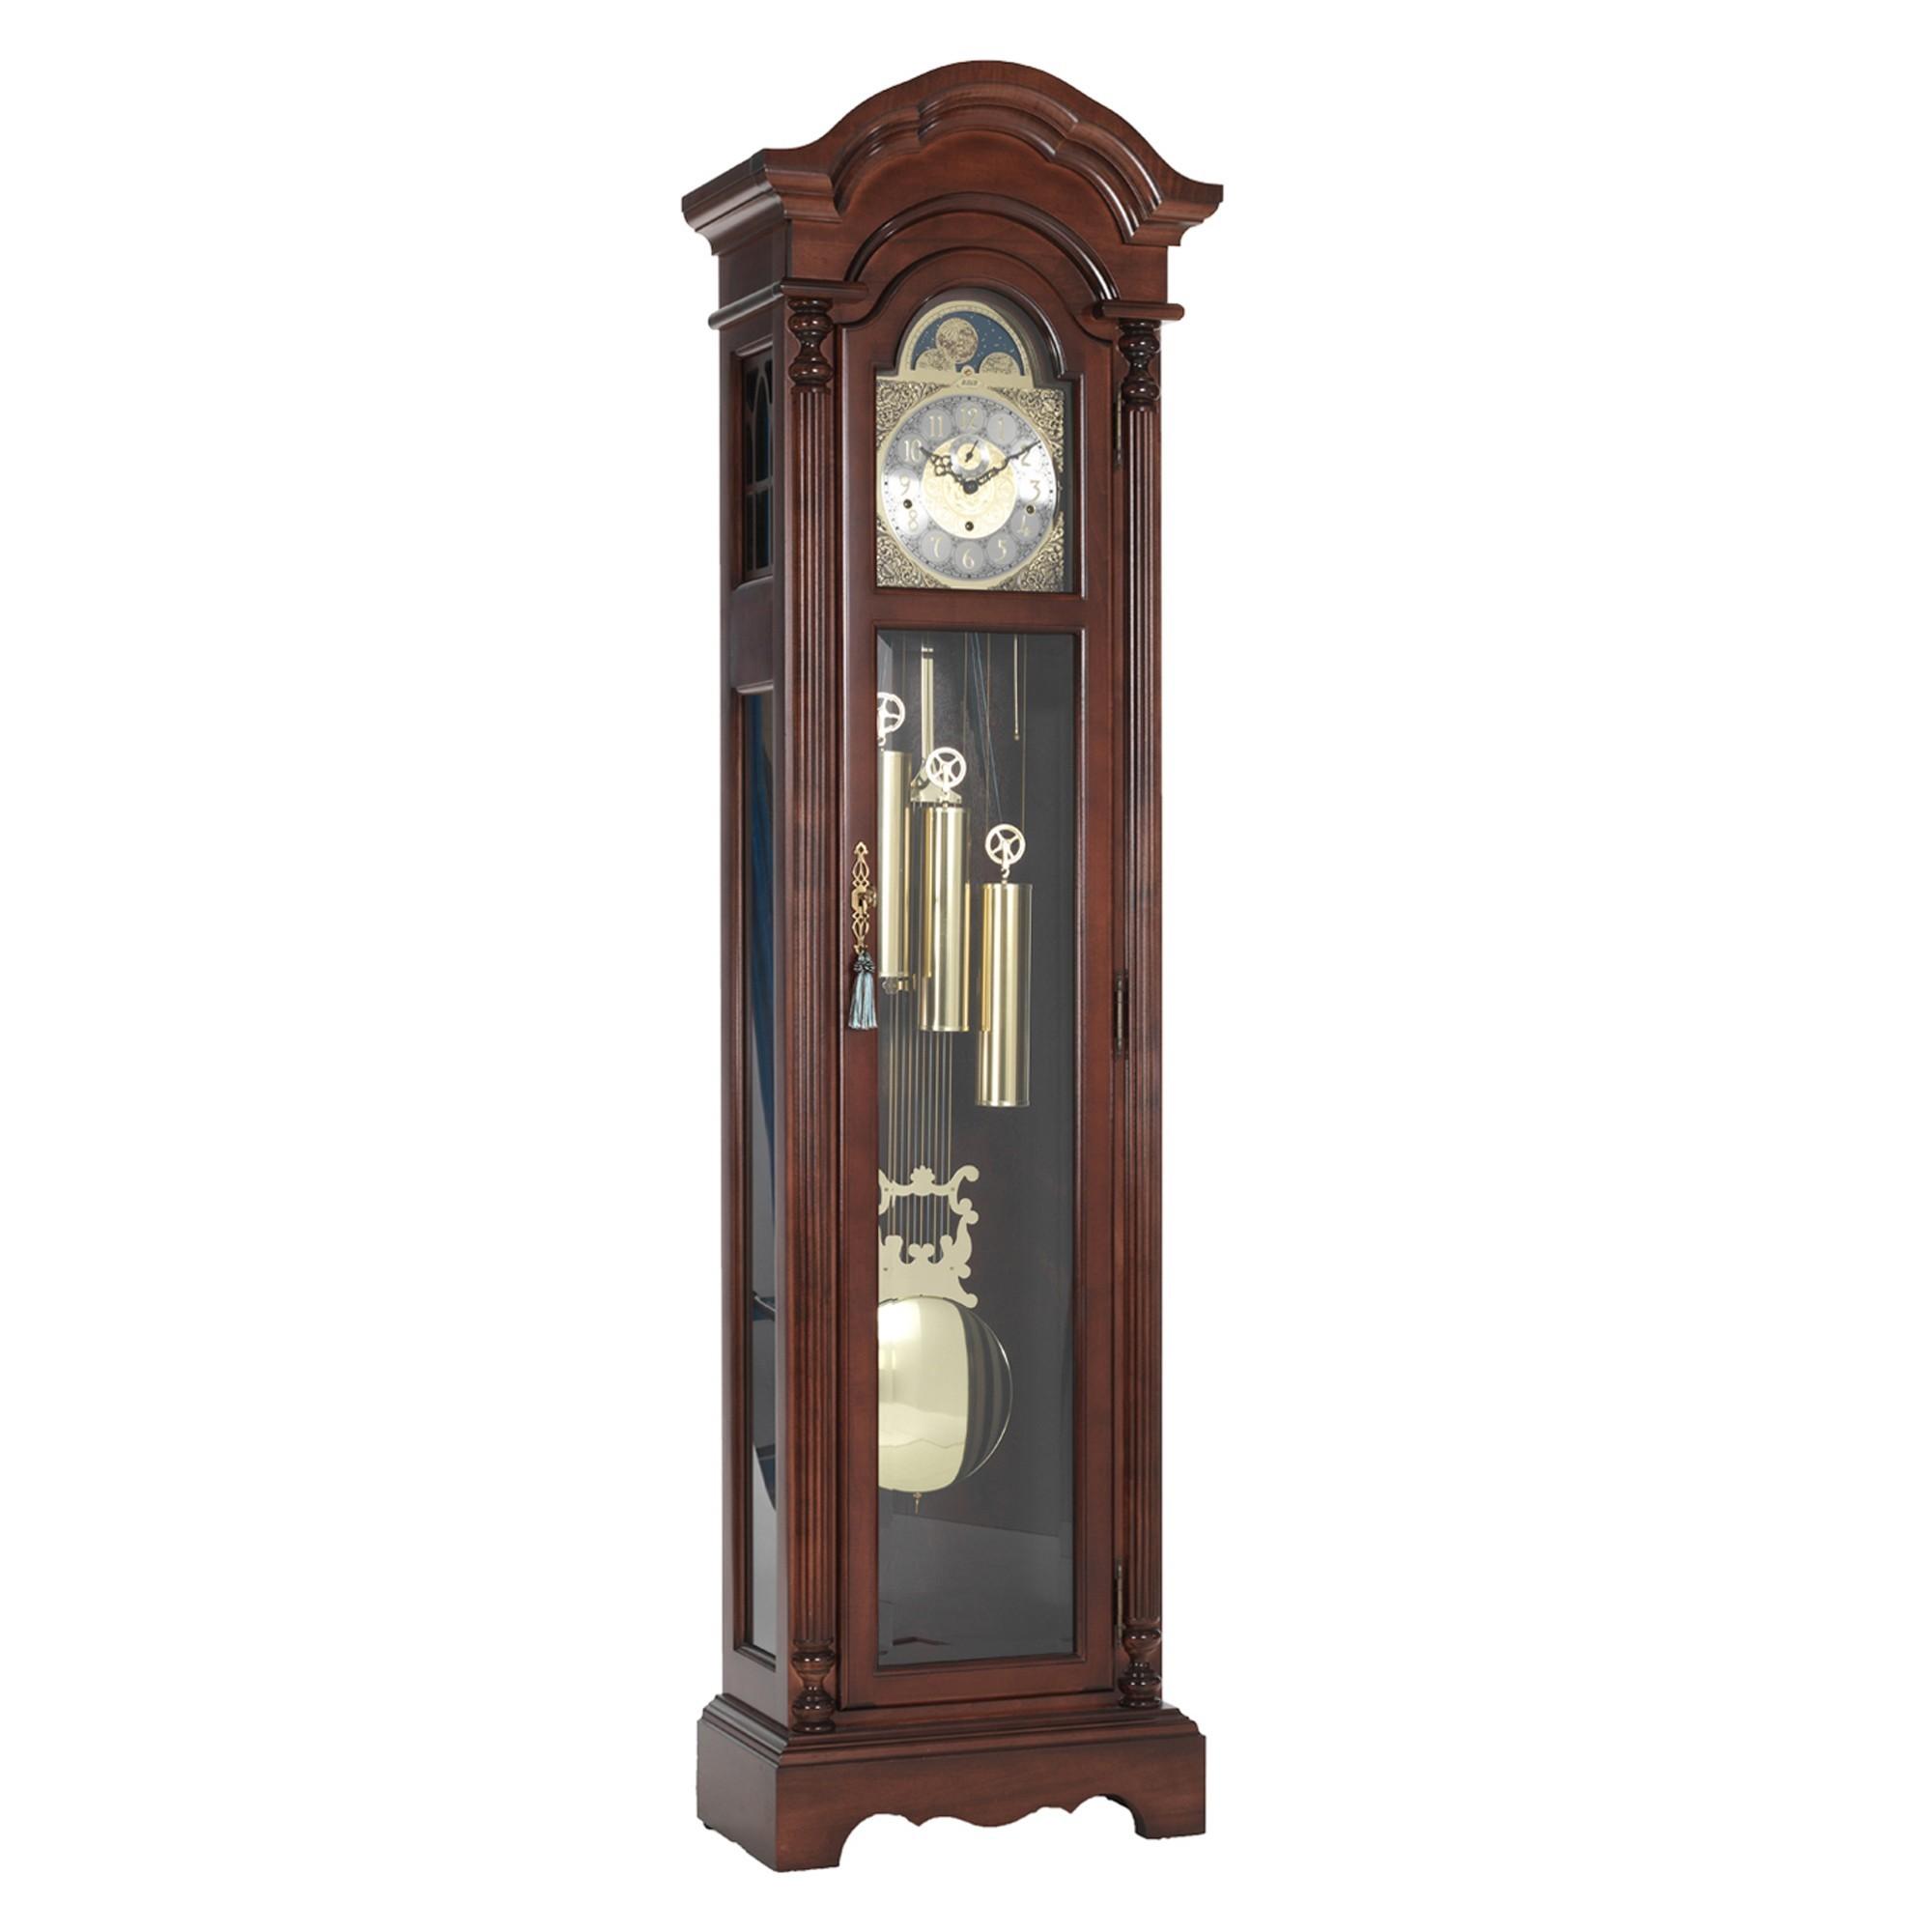 Berkeley Mahogany Triple Chime Grandfather Clock